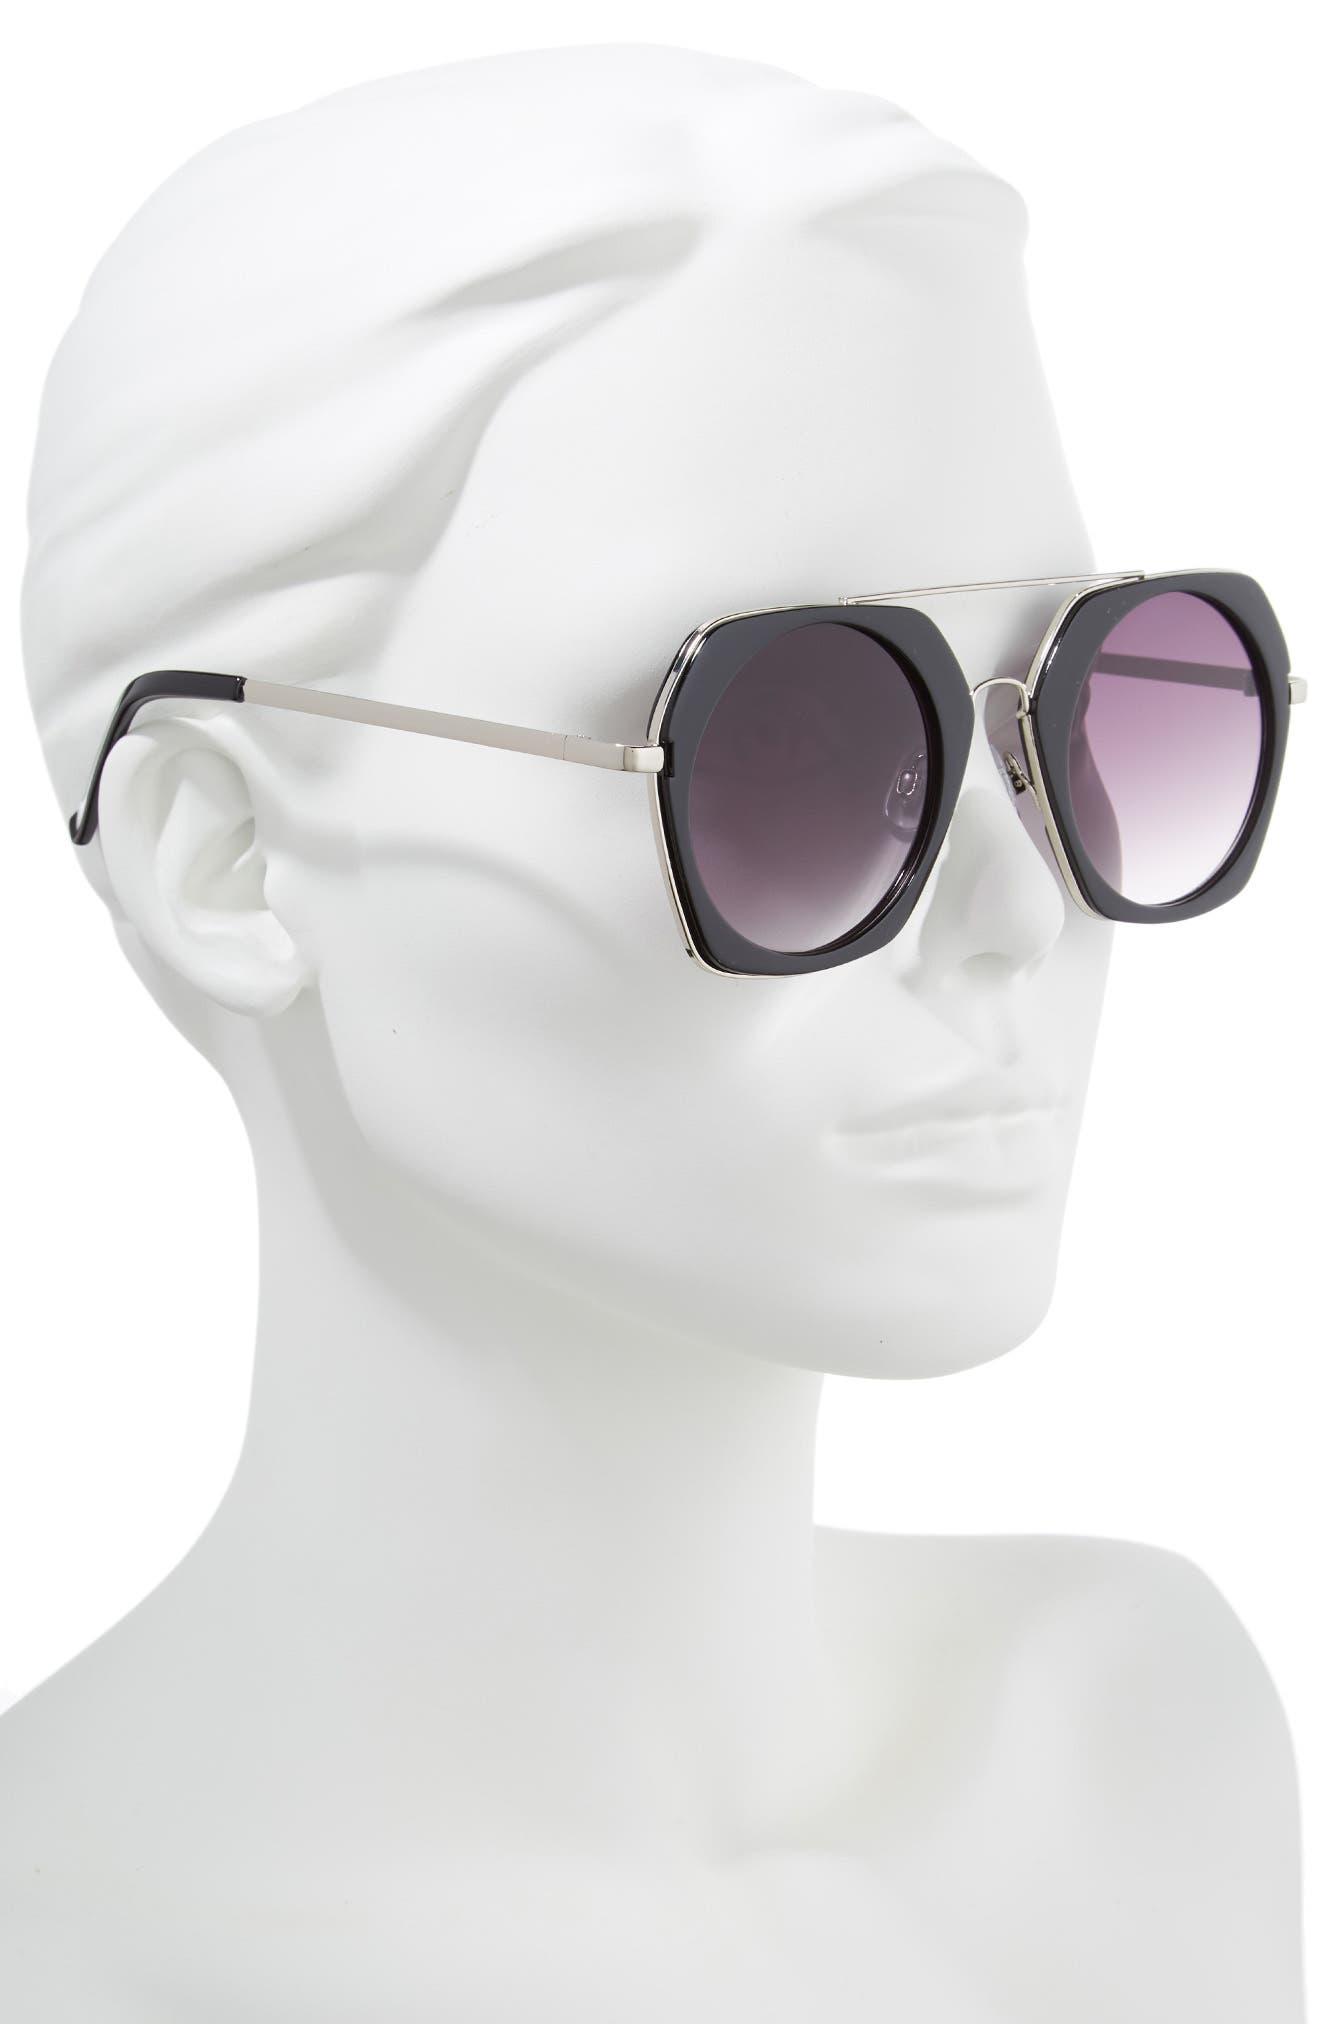 50mm Geometric Aviator Sunglasses,                             Alternate thumbnail 2, color,                             BLACK